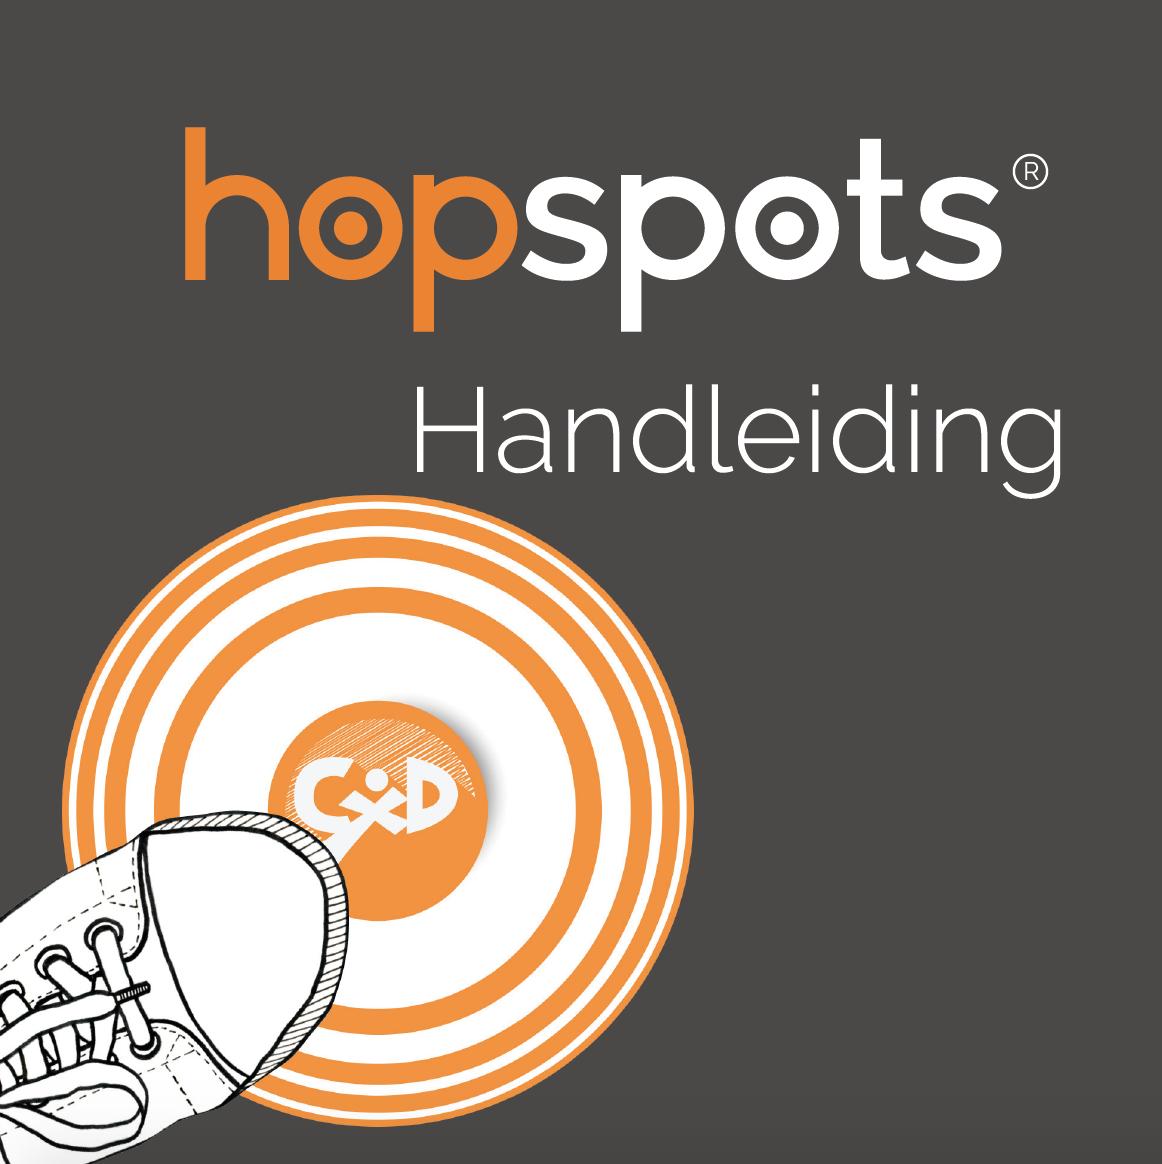 Hopspots Handleiding